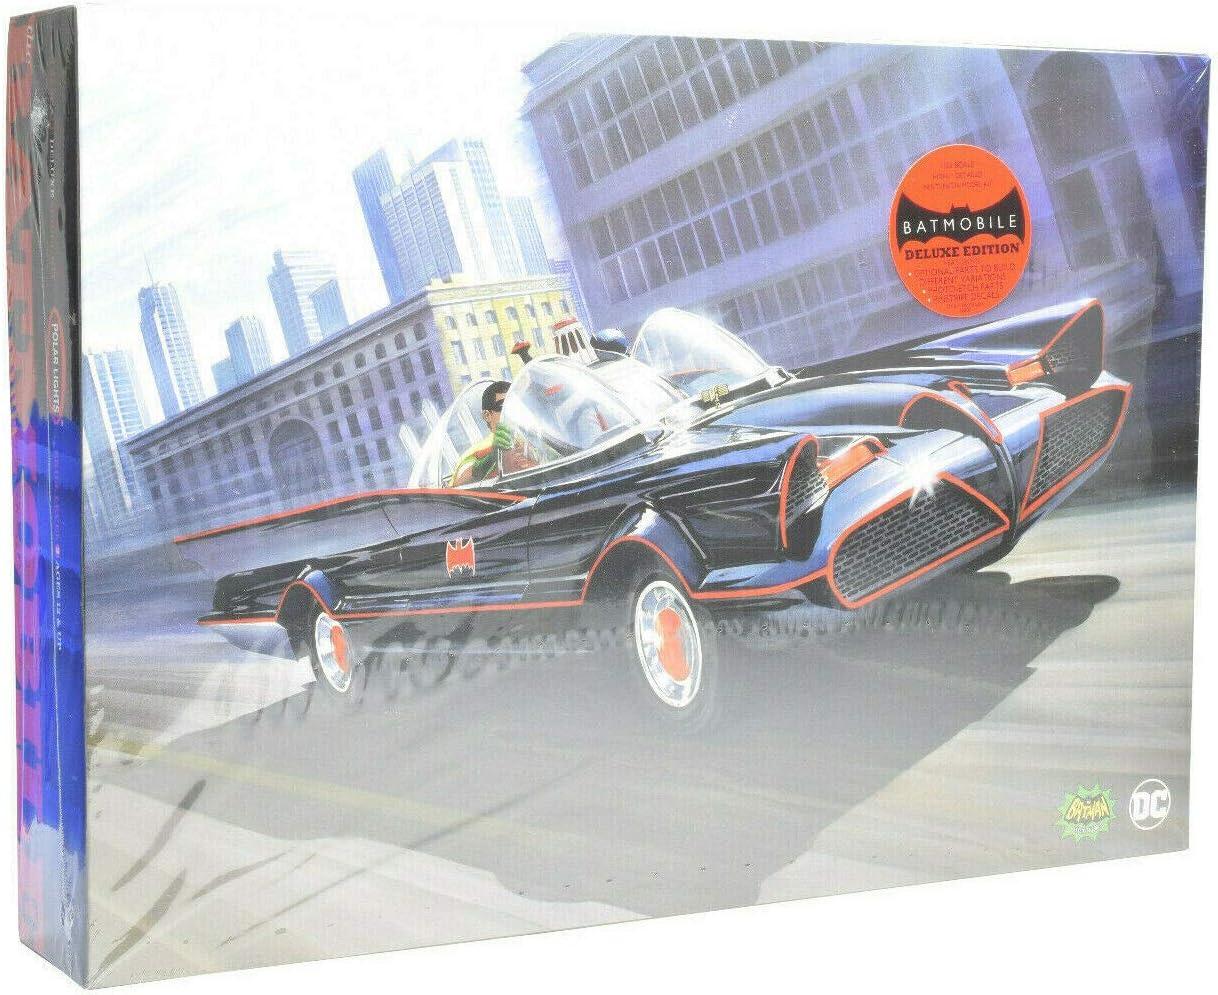 Polar Lights Premium Hobbies 1966 TV Batman - 完全送料無料 Series 超人気 専門店 Batmobile